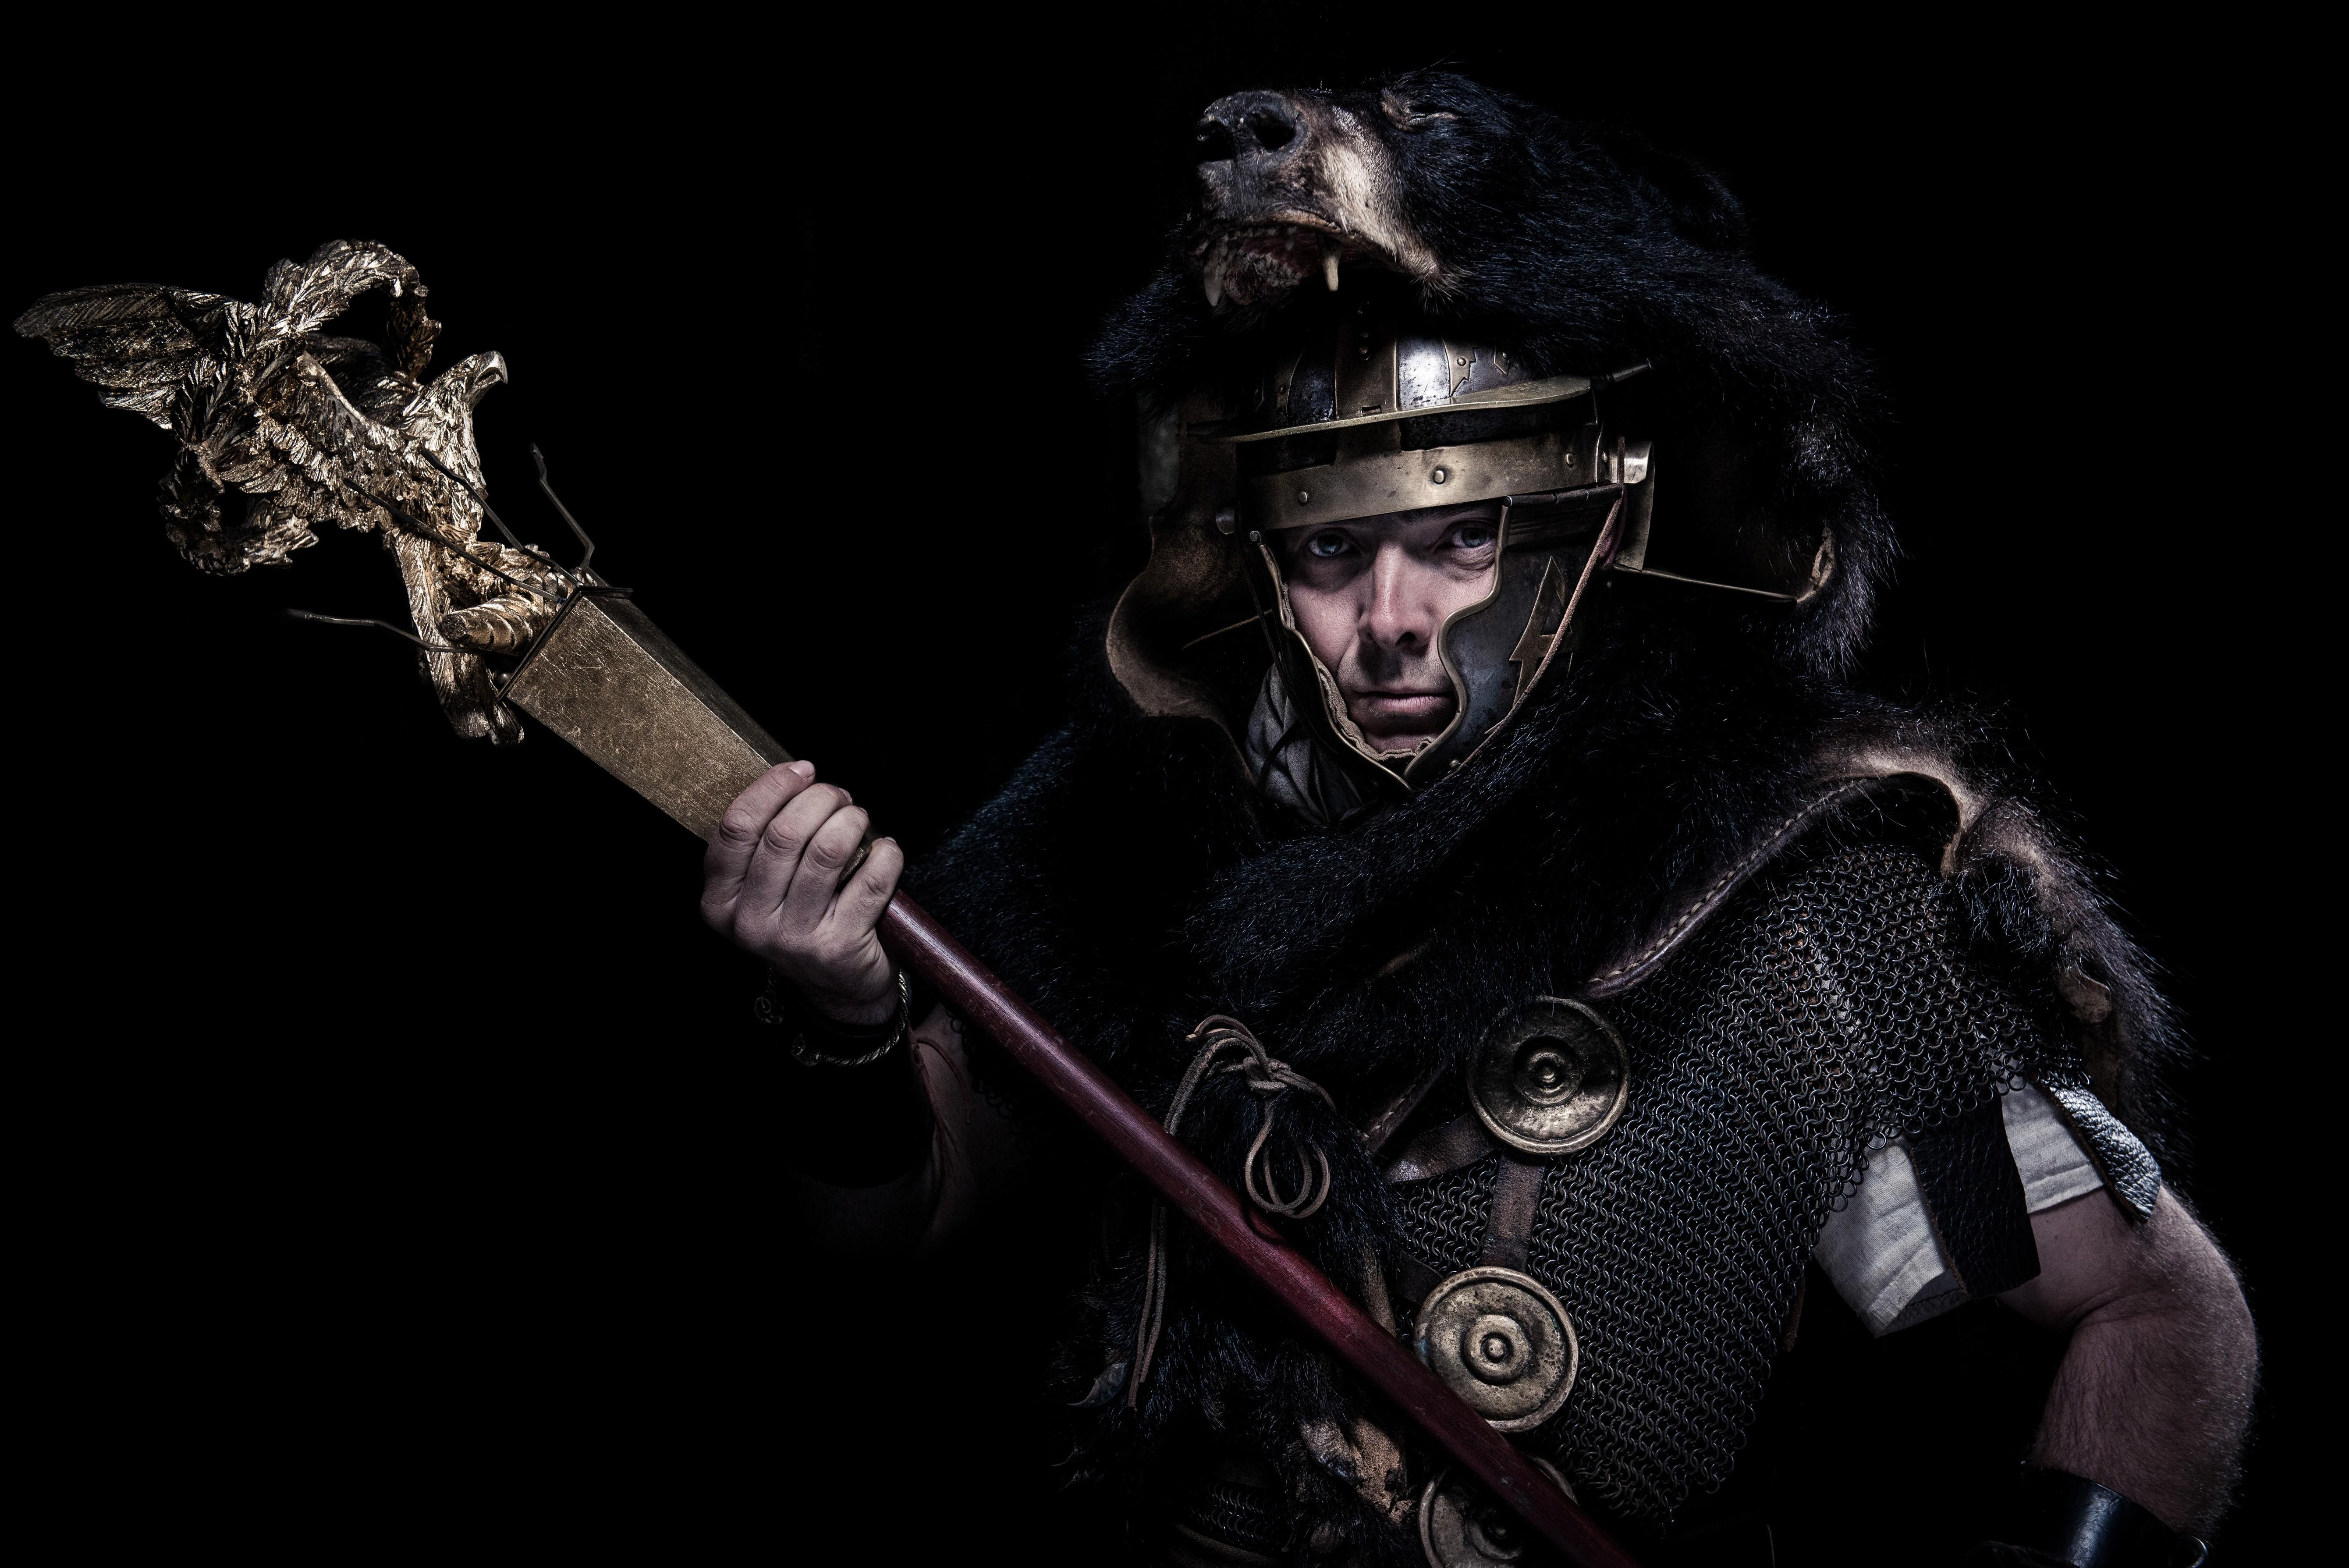 Wallpaper Artwork Soldier Roman Warrior Golden Eagles